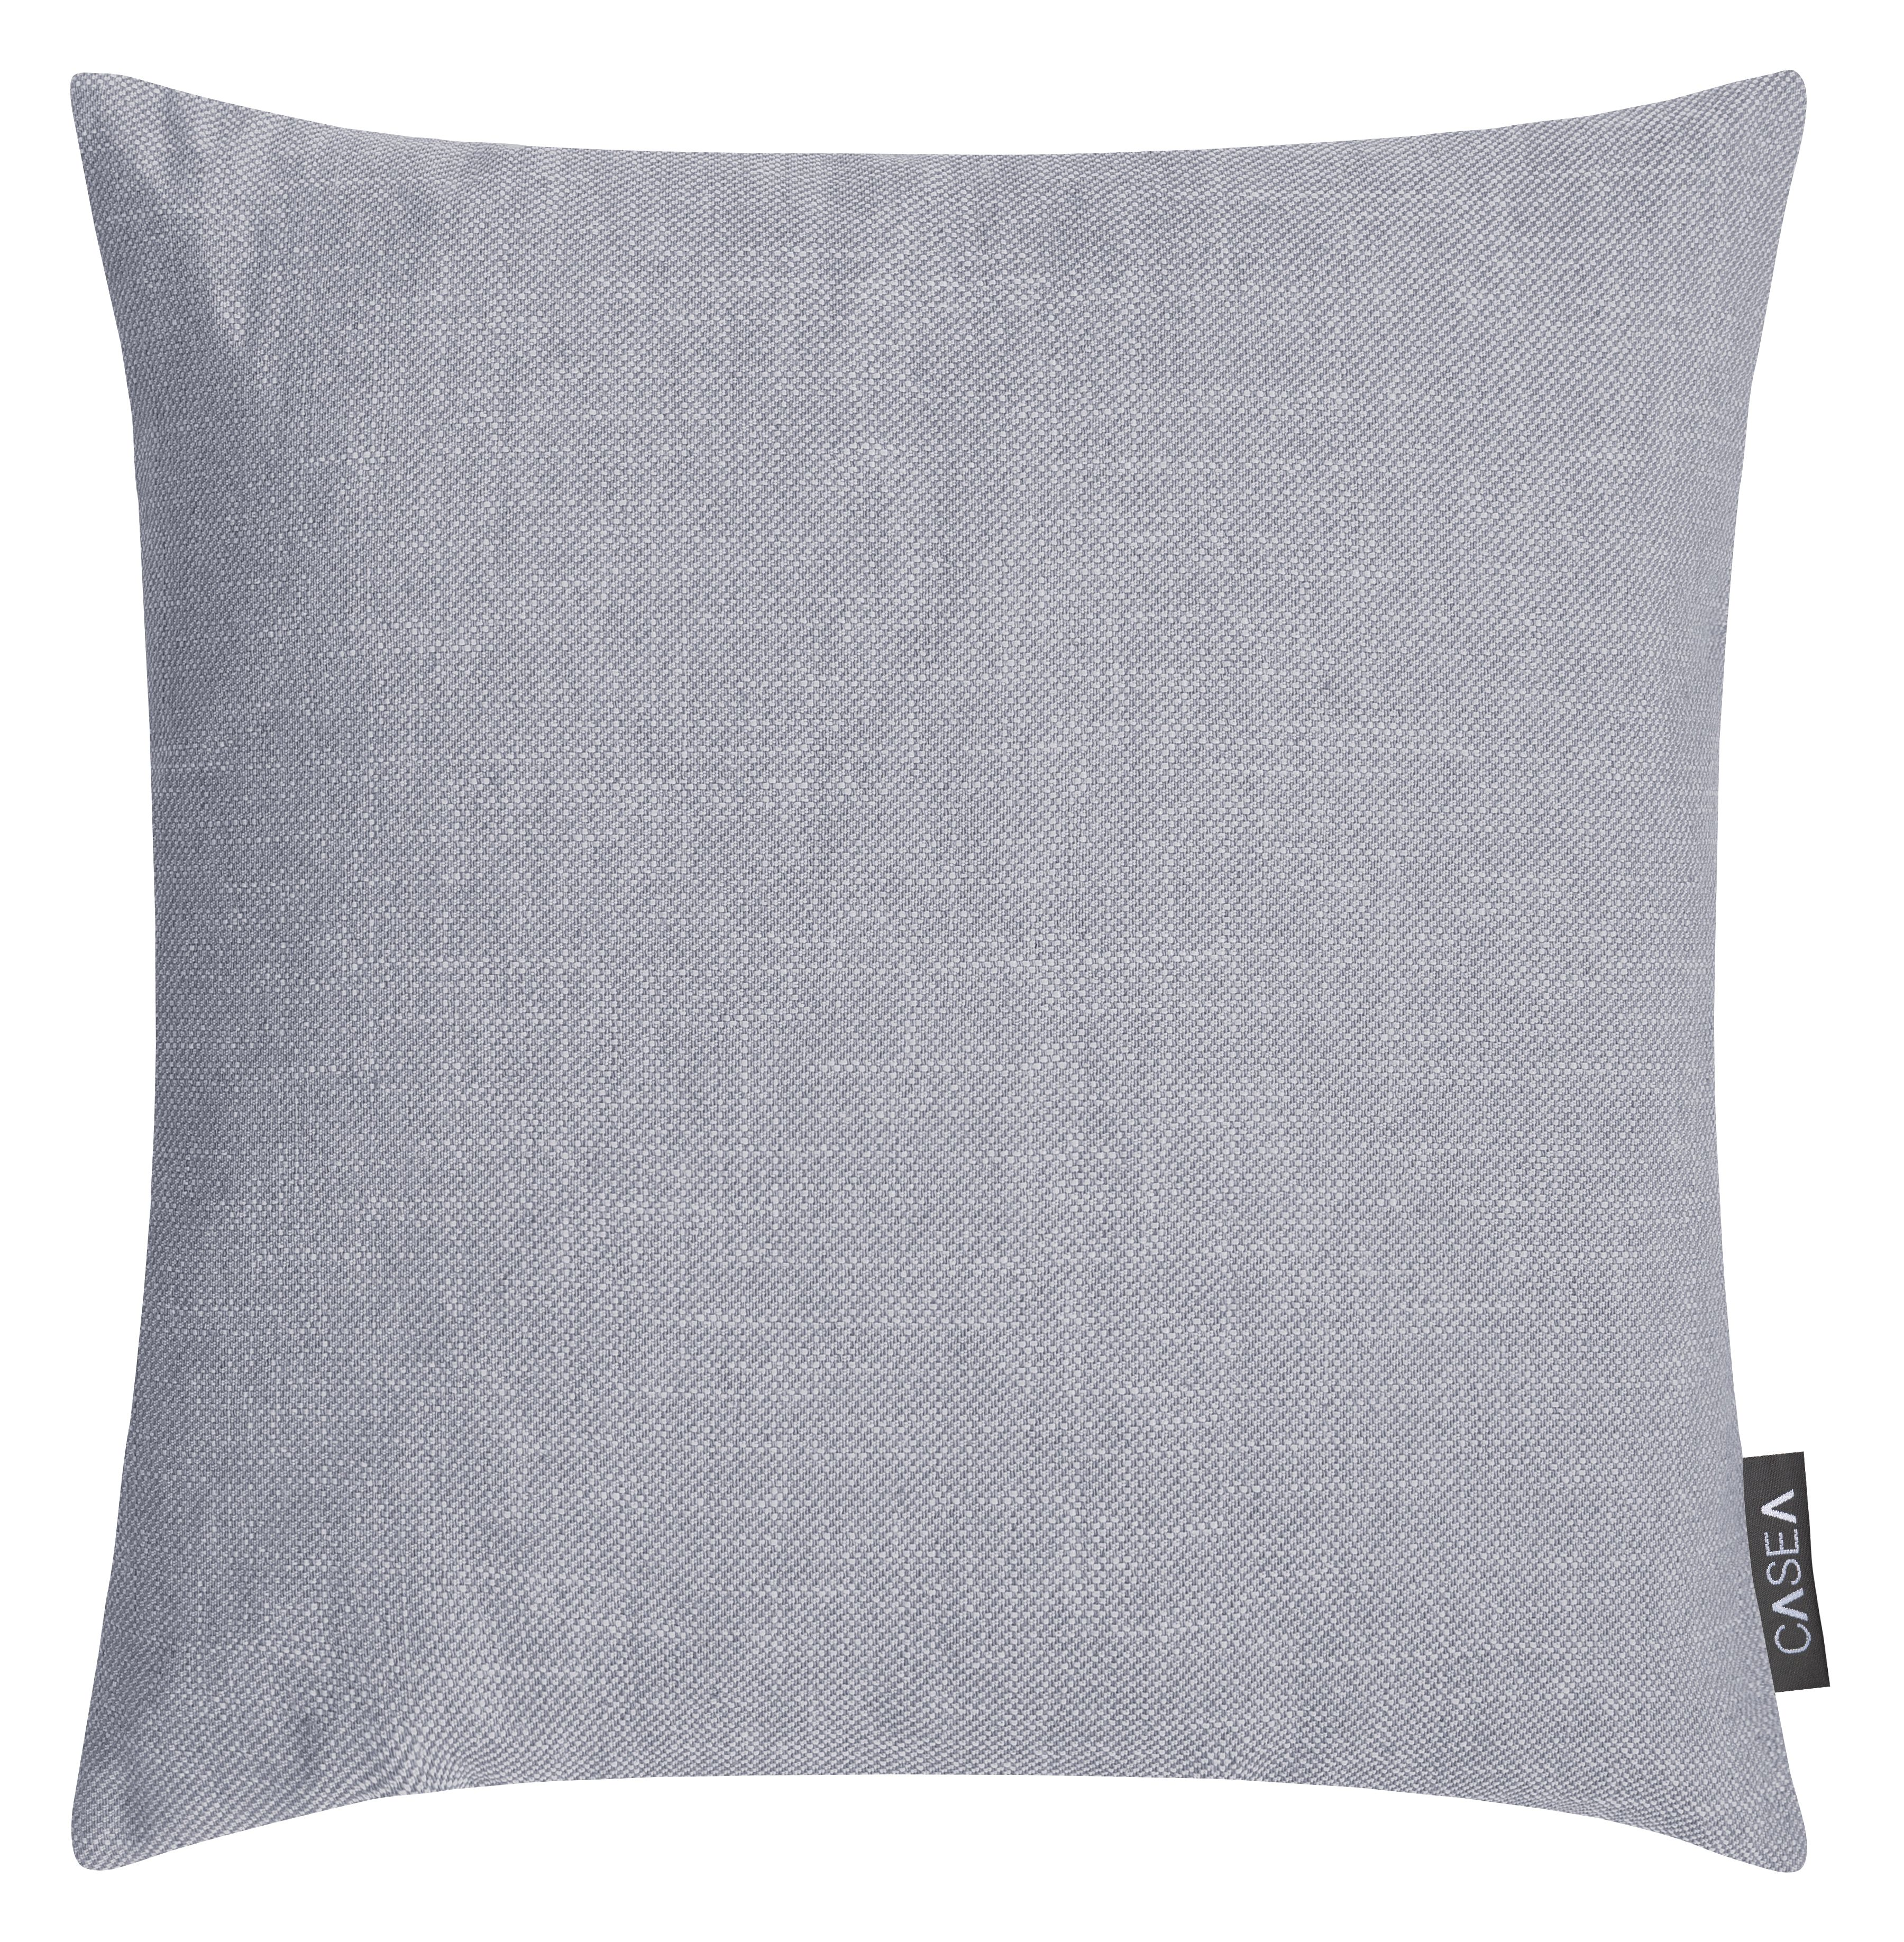 Kissenhulle Casea Selection In Der Farbe Grau 40x40 Cm Farbe